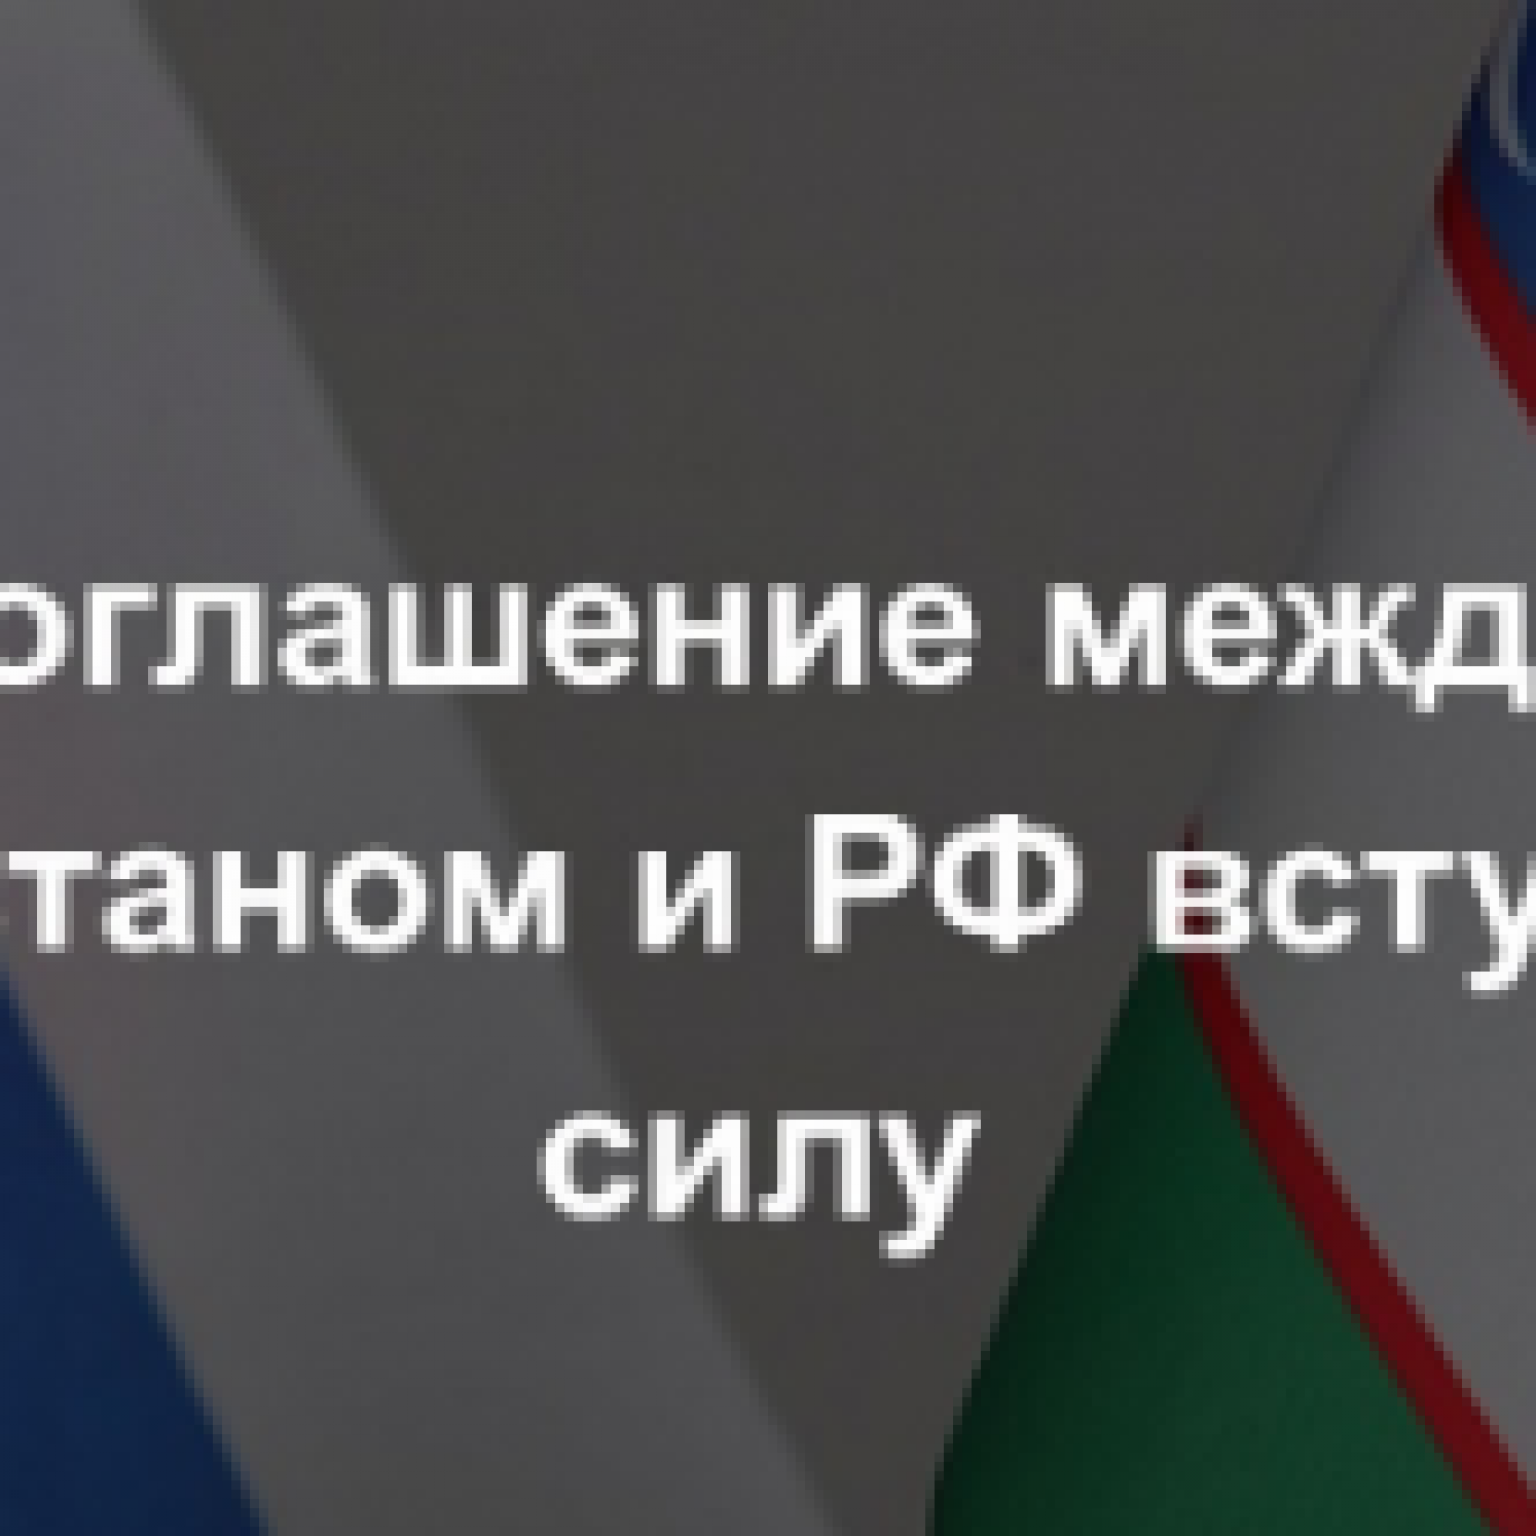 Соглашение между узбекистанам и РФ